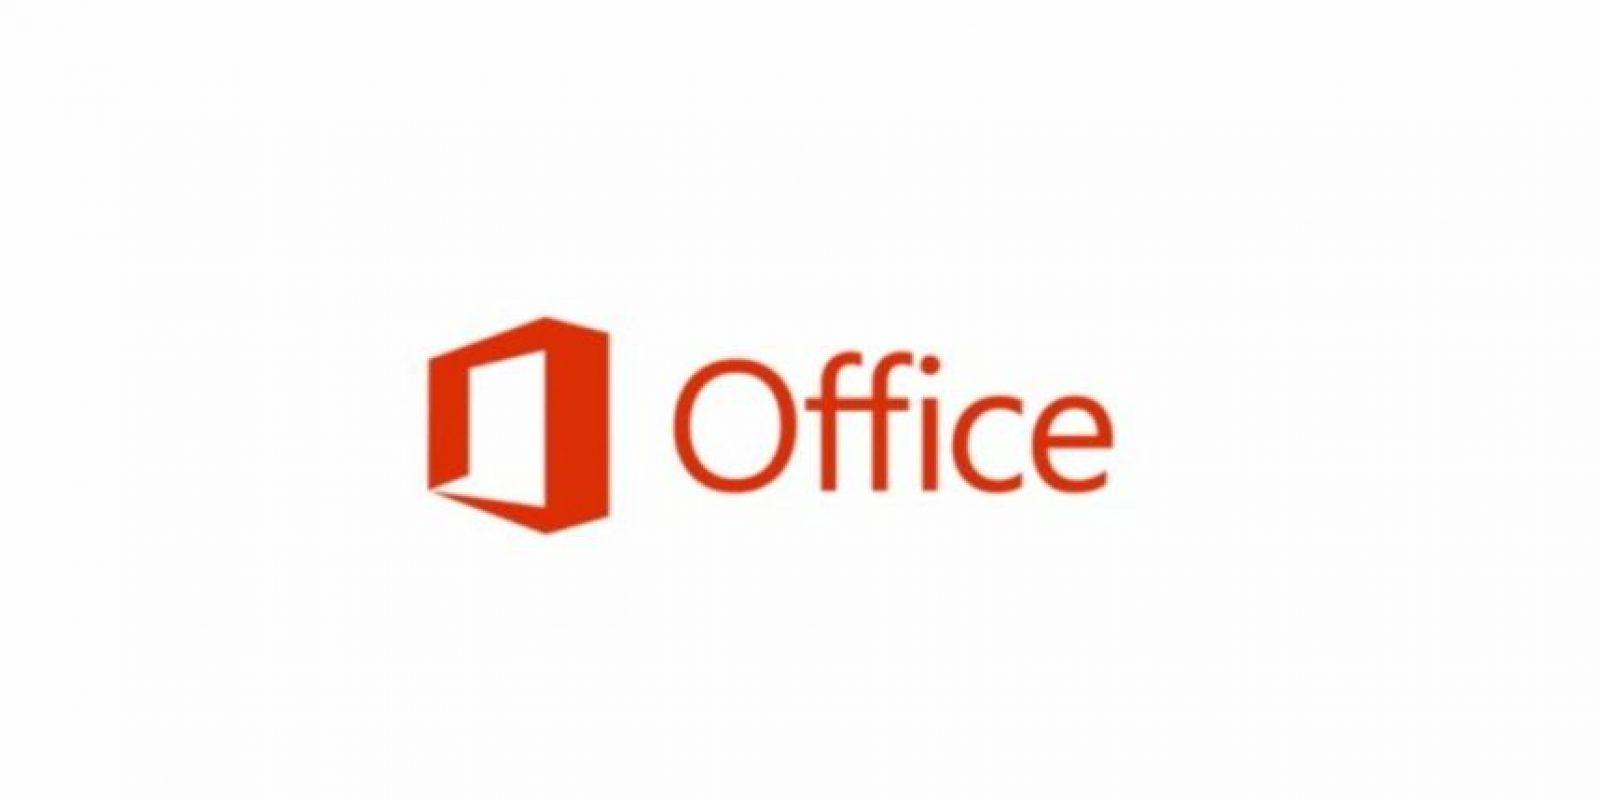 Office 2016 ya está a la venta. Foto:Microsoft